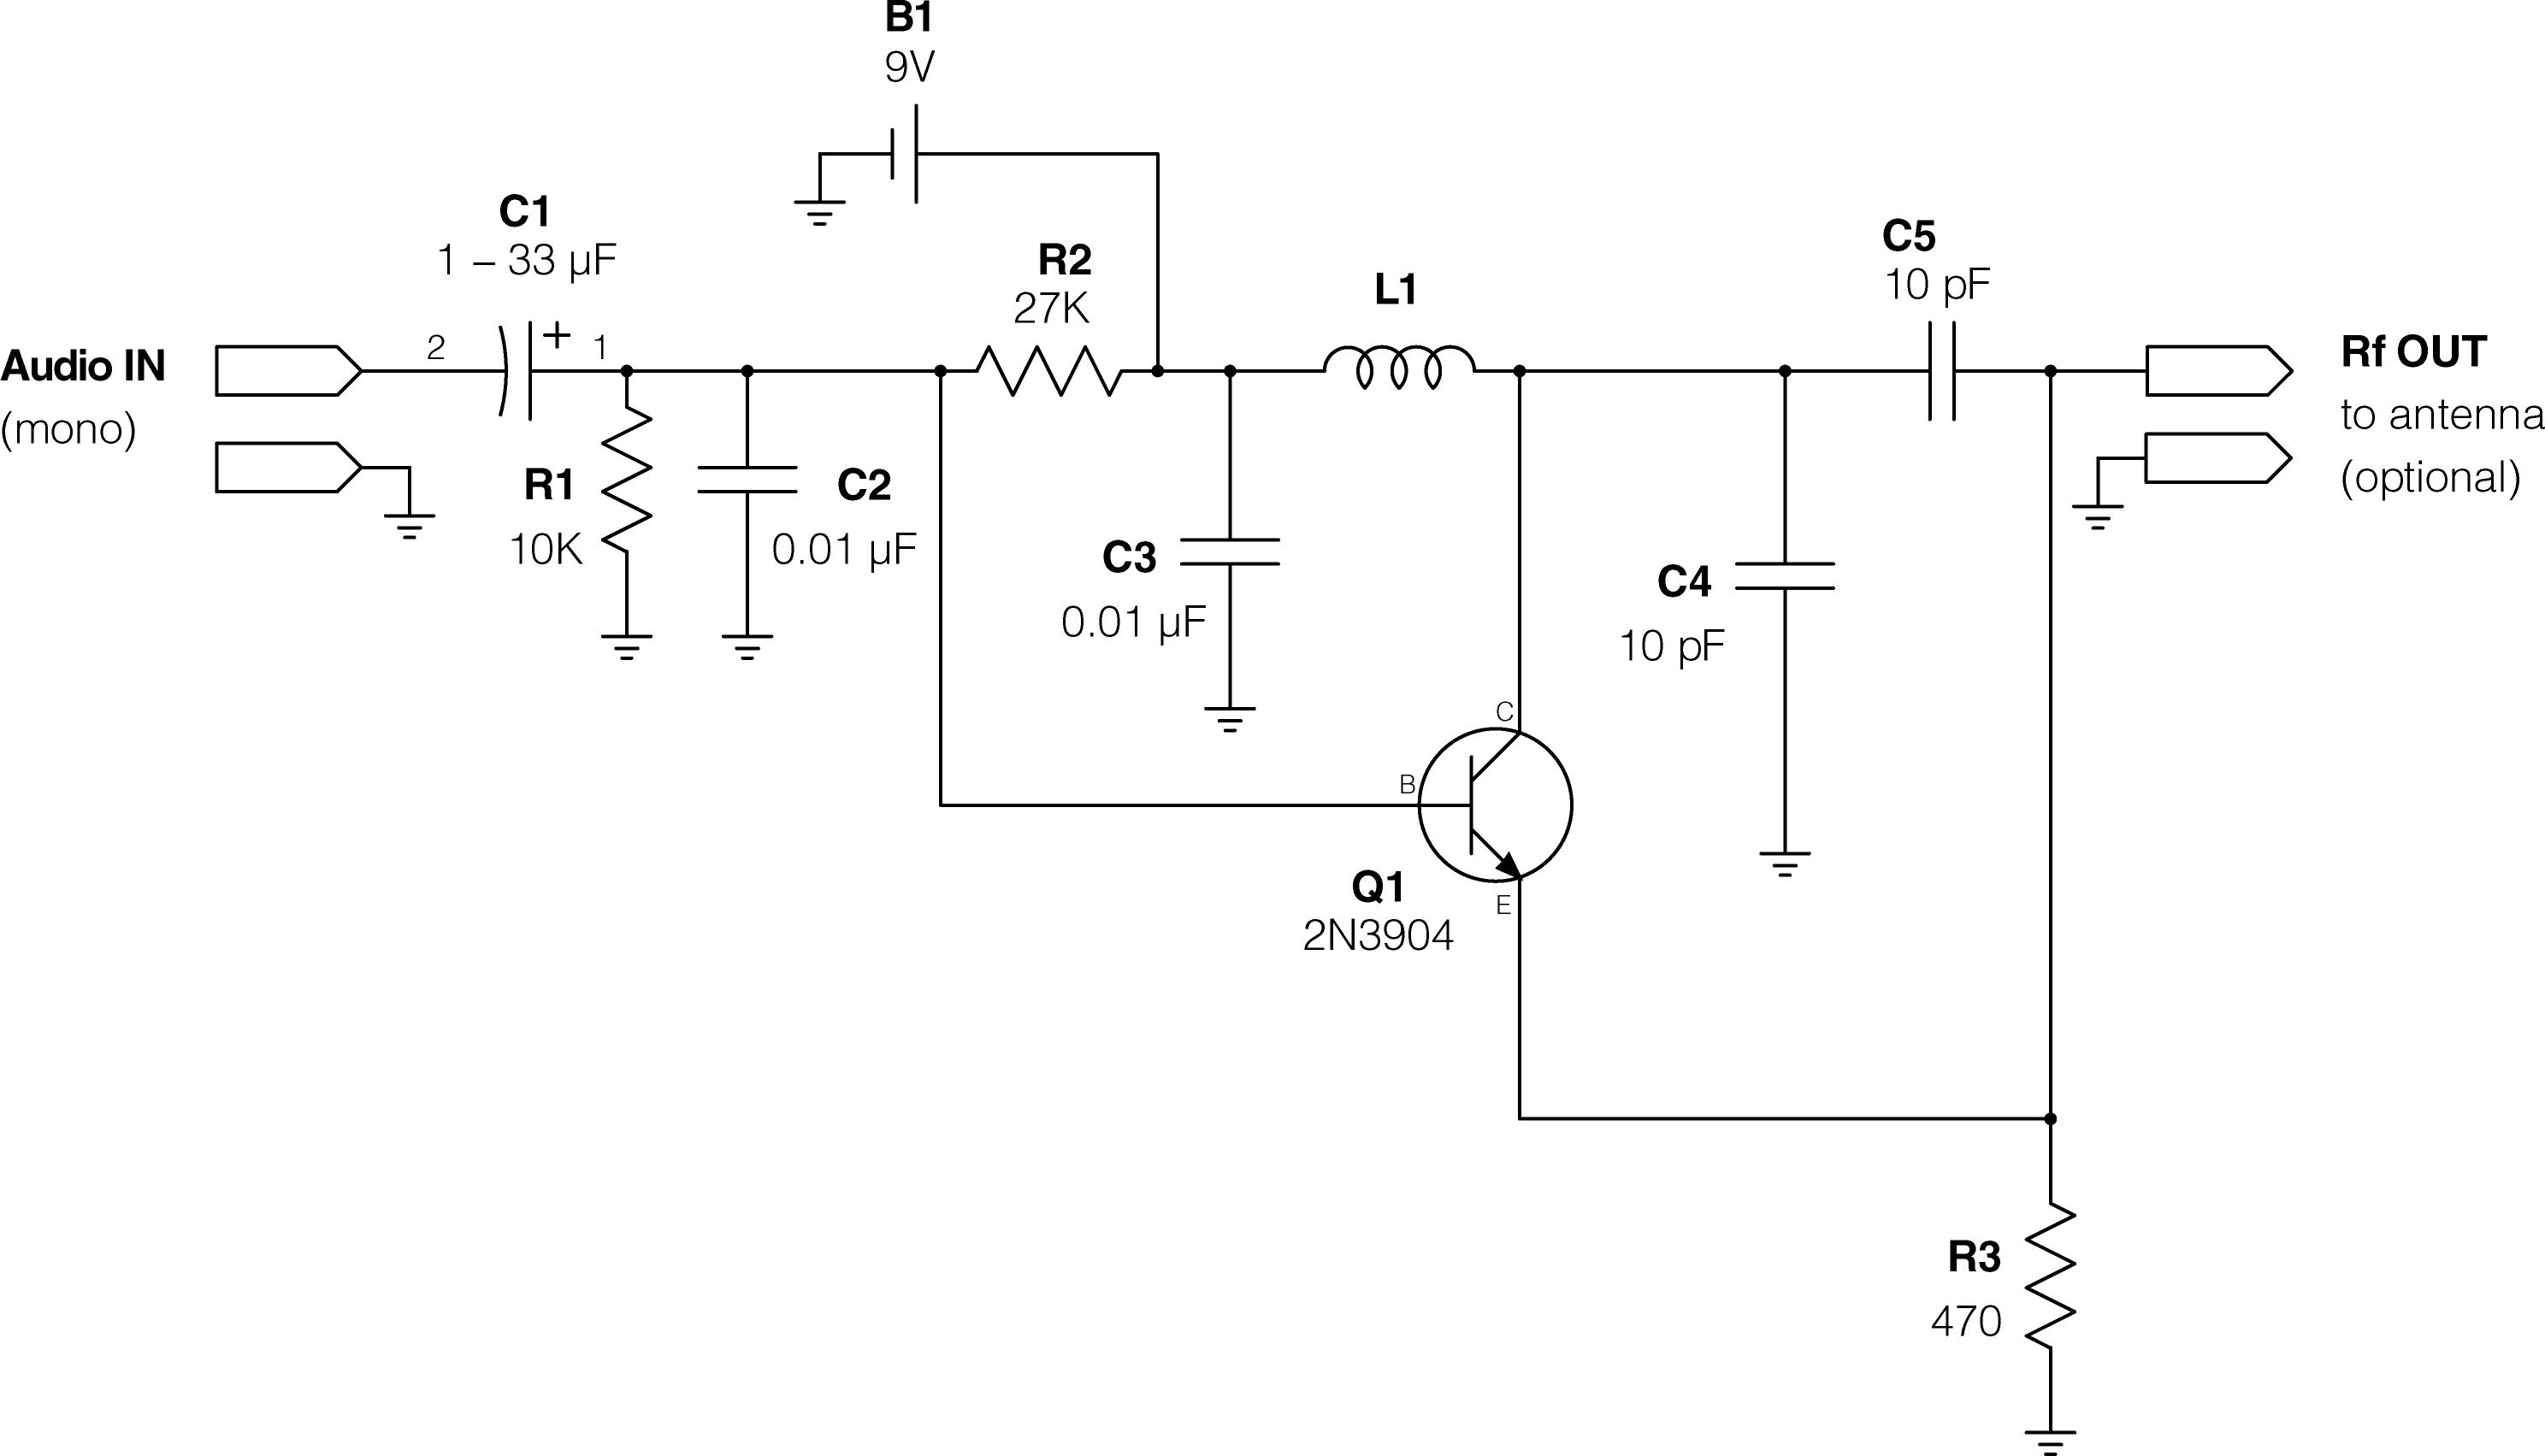 build a 9v wireless microphone fm transmitter super circuit diagram super simple ipod fm transmitter make build a 9v wireless microphone fm transmitter super circuit diagram